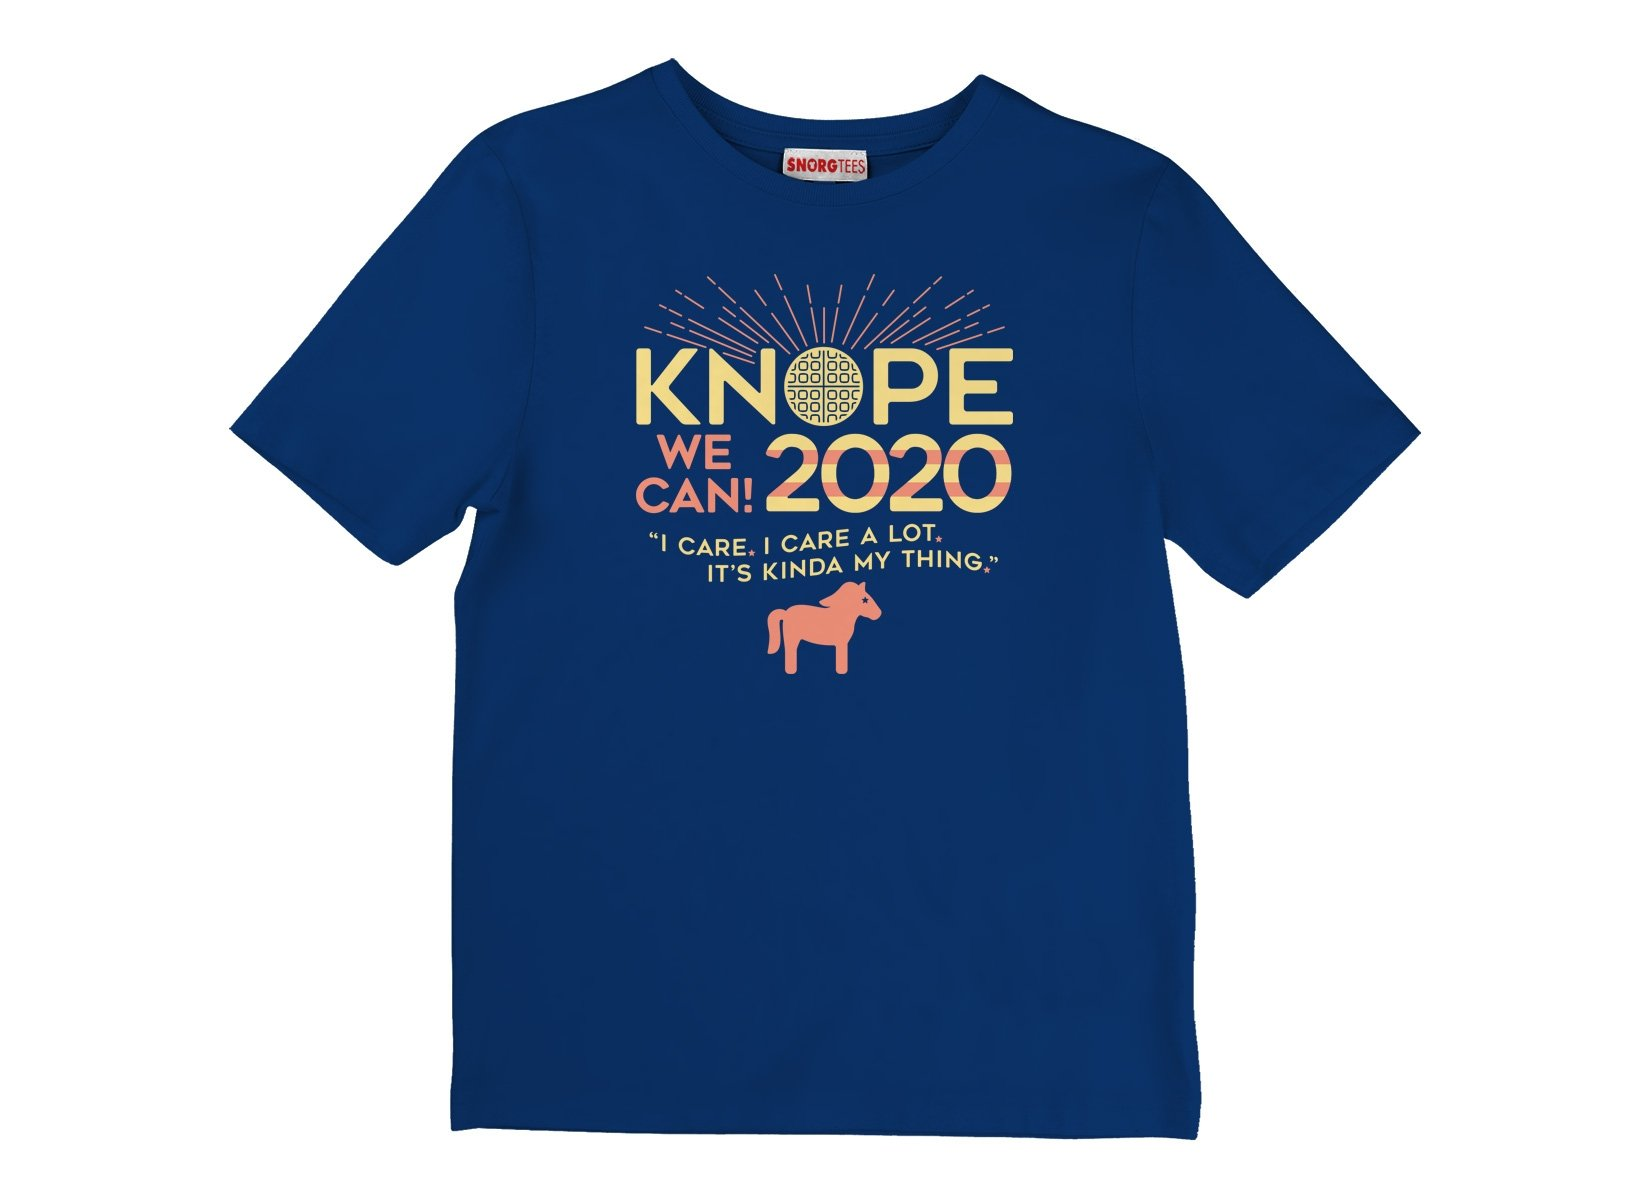 Knope 2020 on Kids T-Shirt